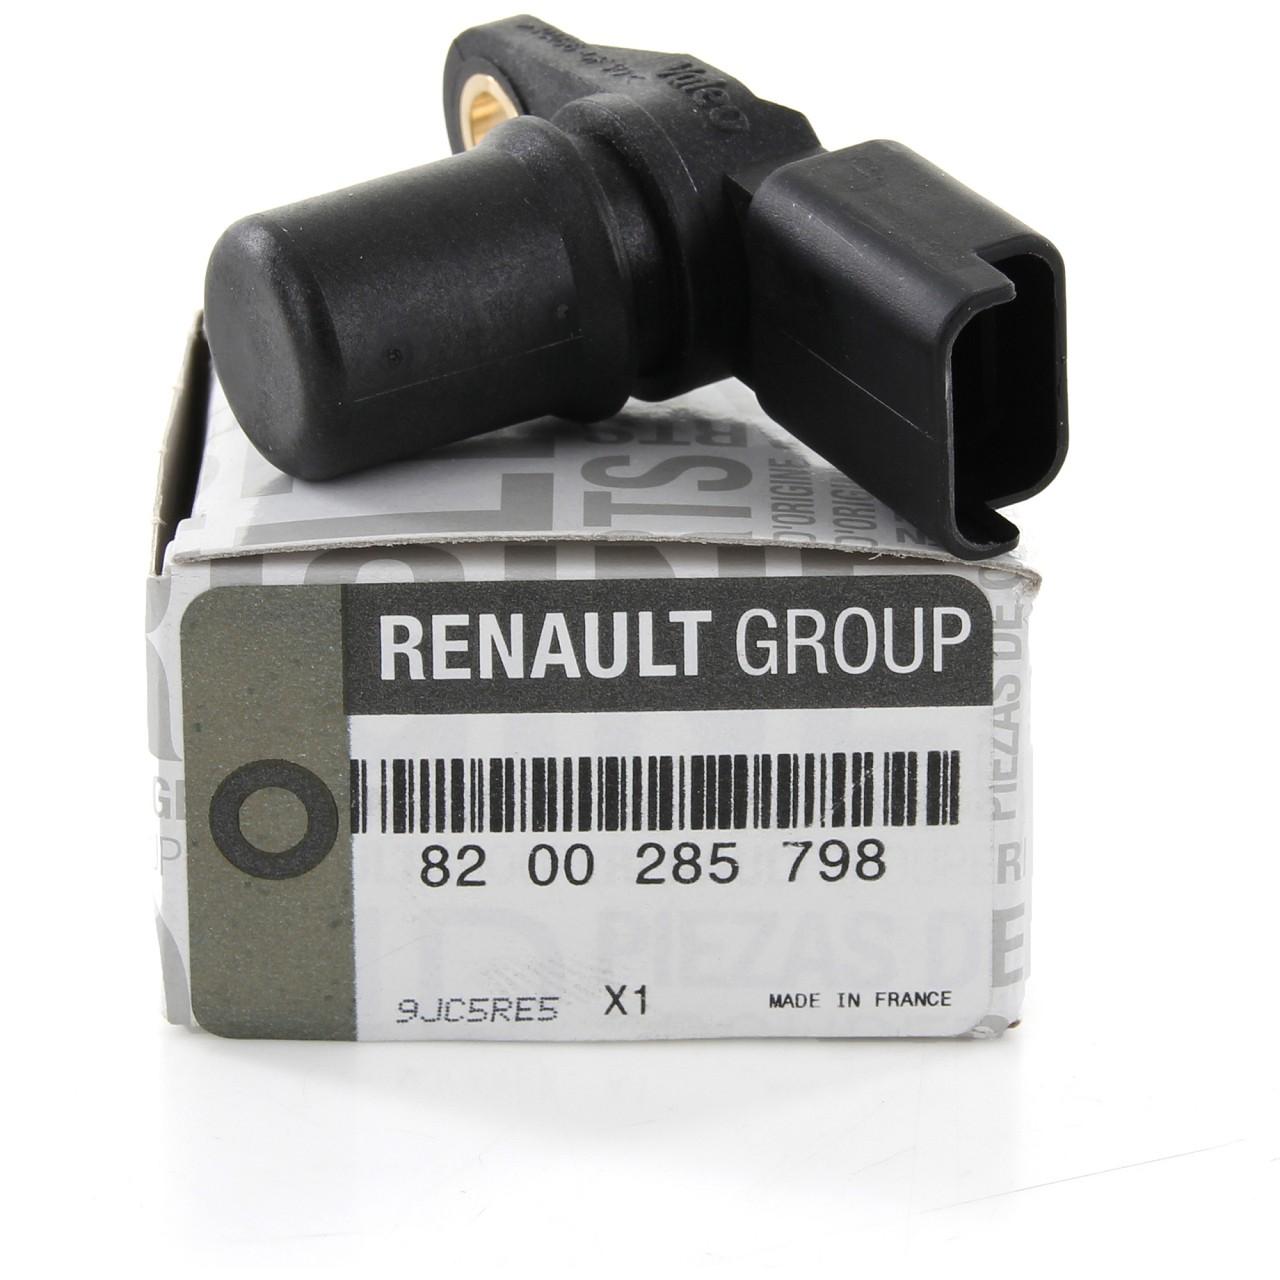 ORIGINAL Renault Kurbelwellensensor Kurbelwellenposition Clio Kangoo 8200285798